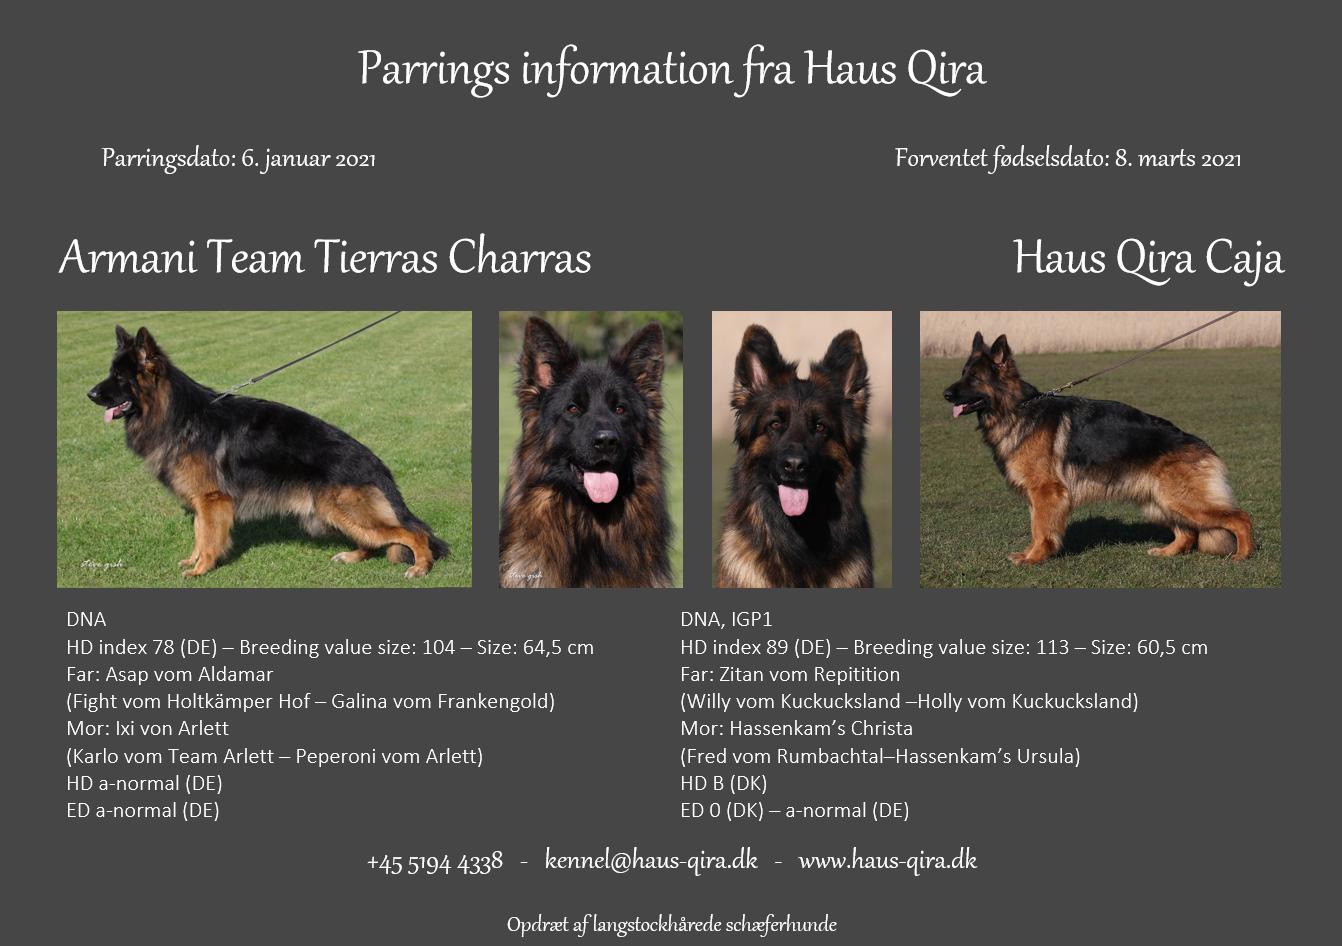 Haus Qira Caja er parret med Armani Team Tierras Charras